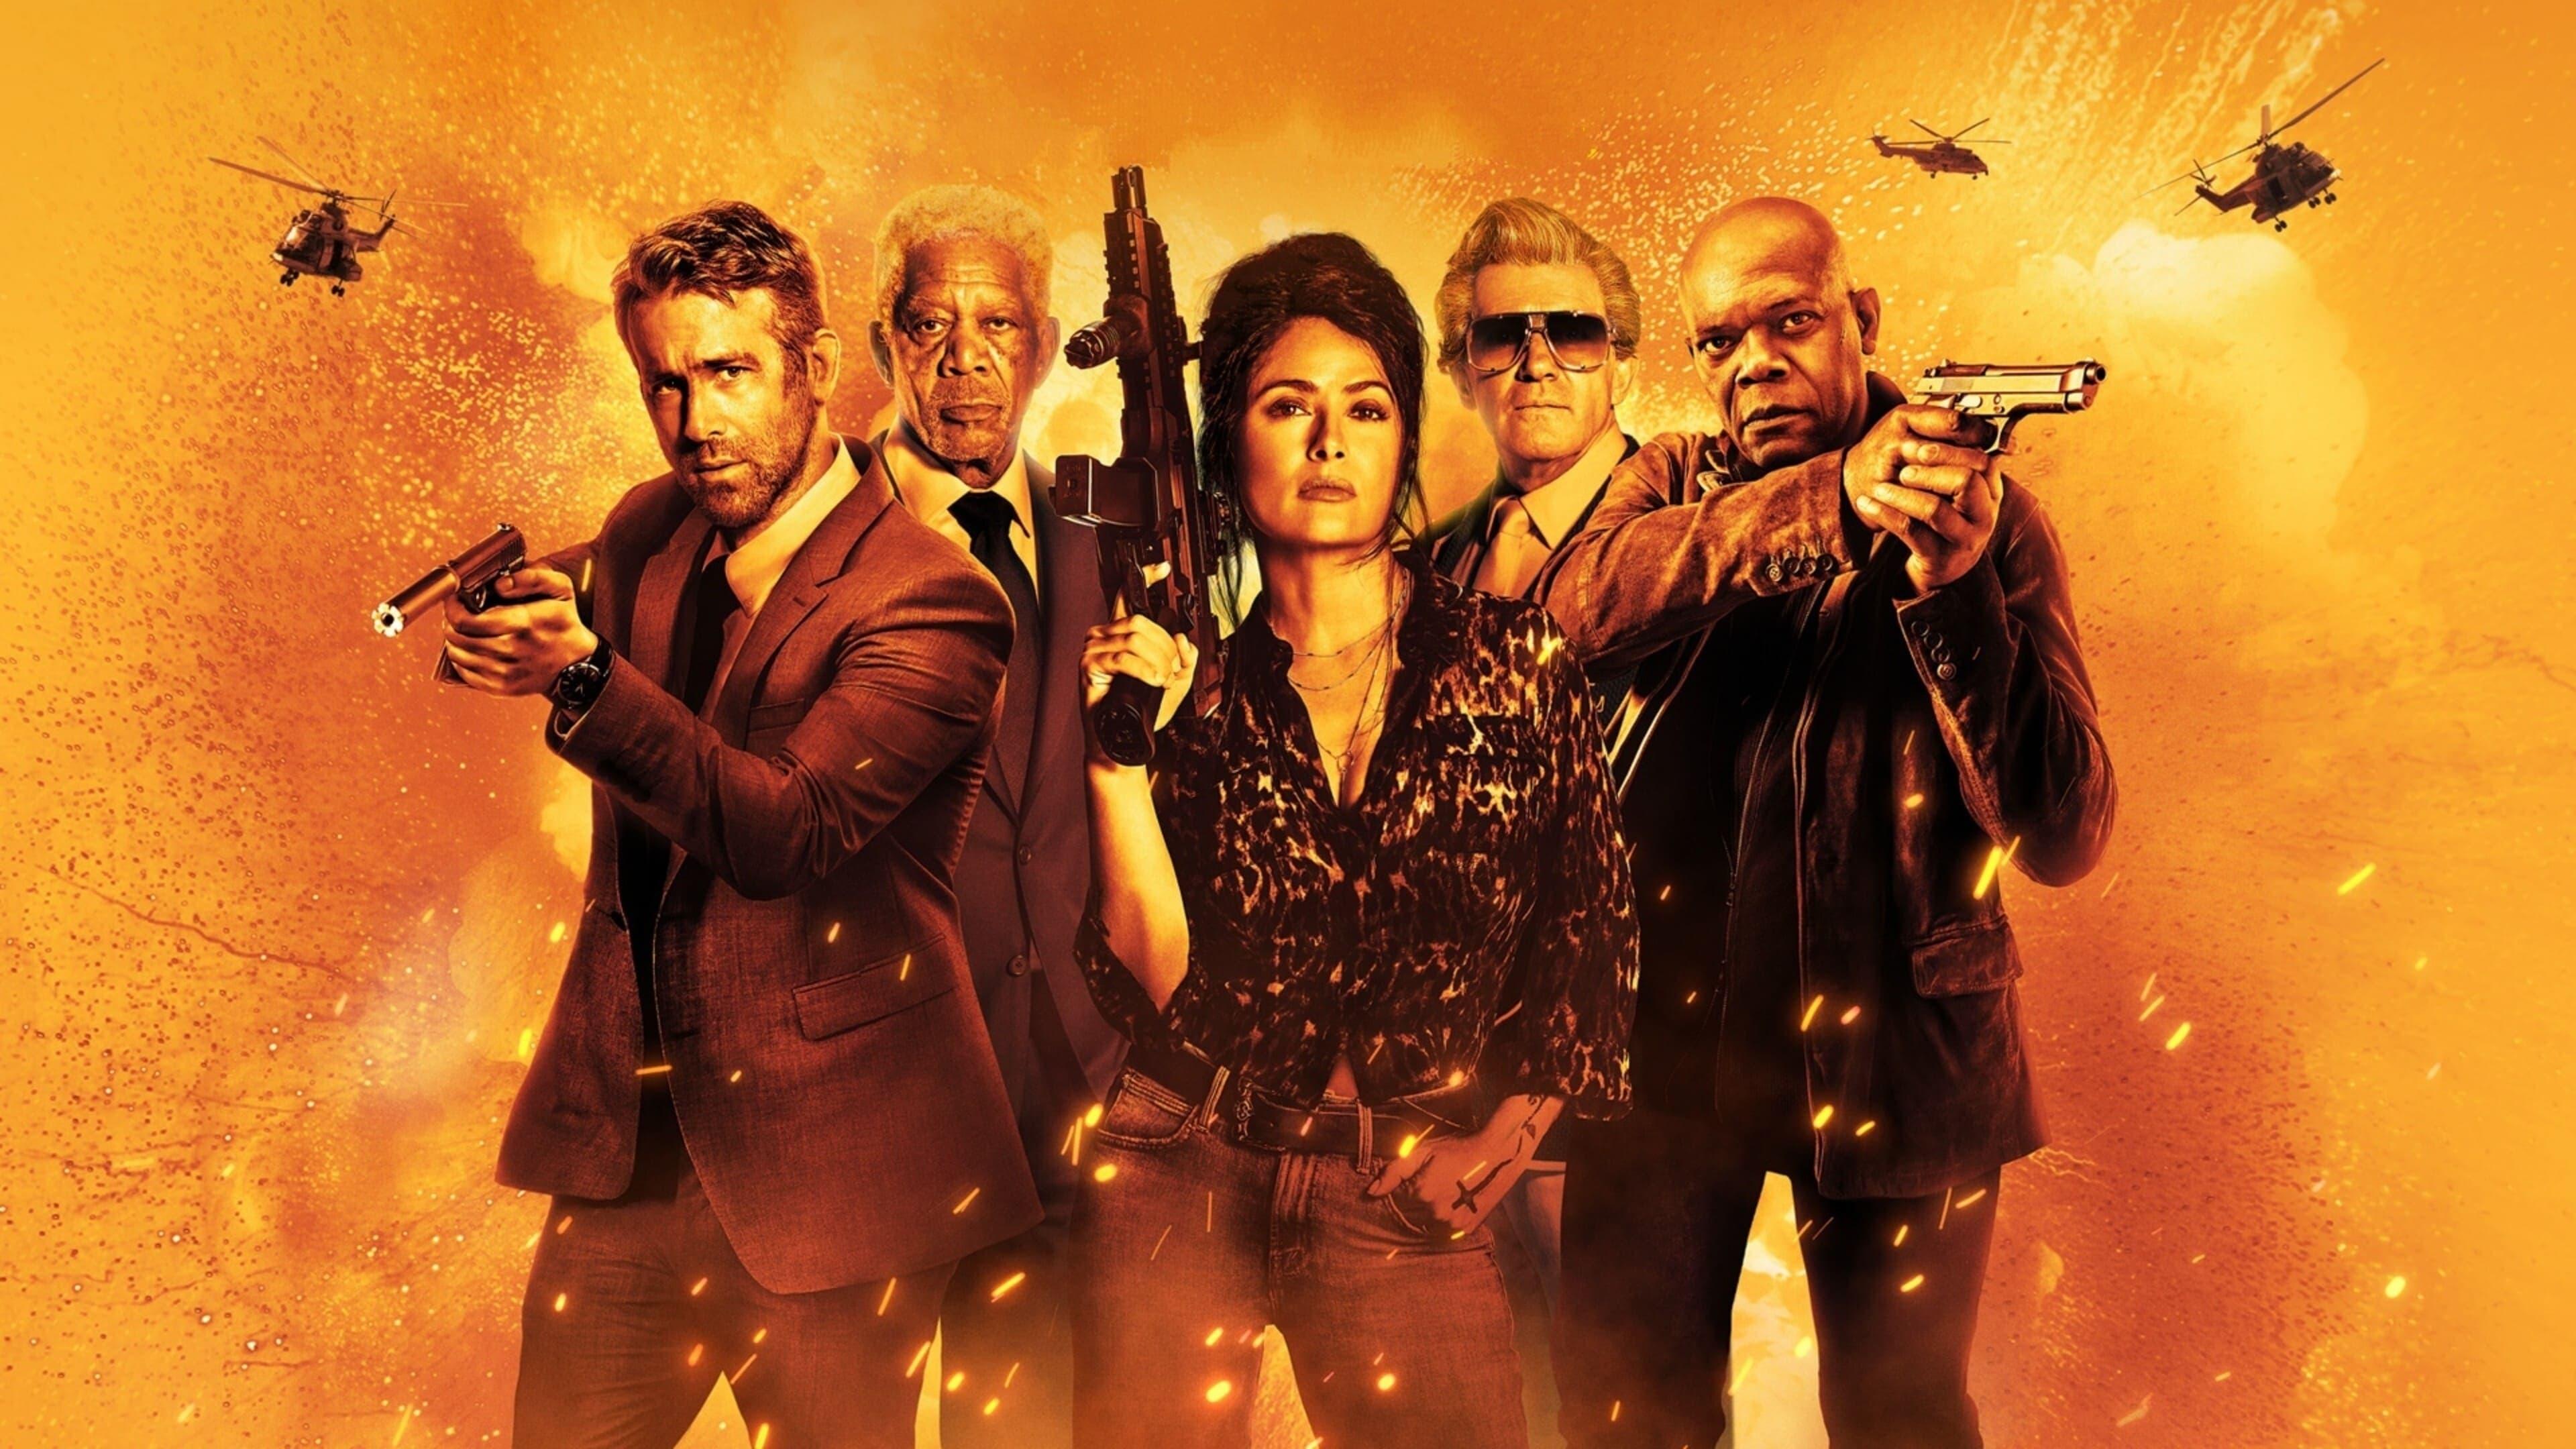 Hitman's Wife's Bodyguard (2021) English Full Movie Watch Online